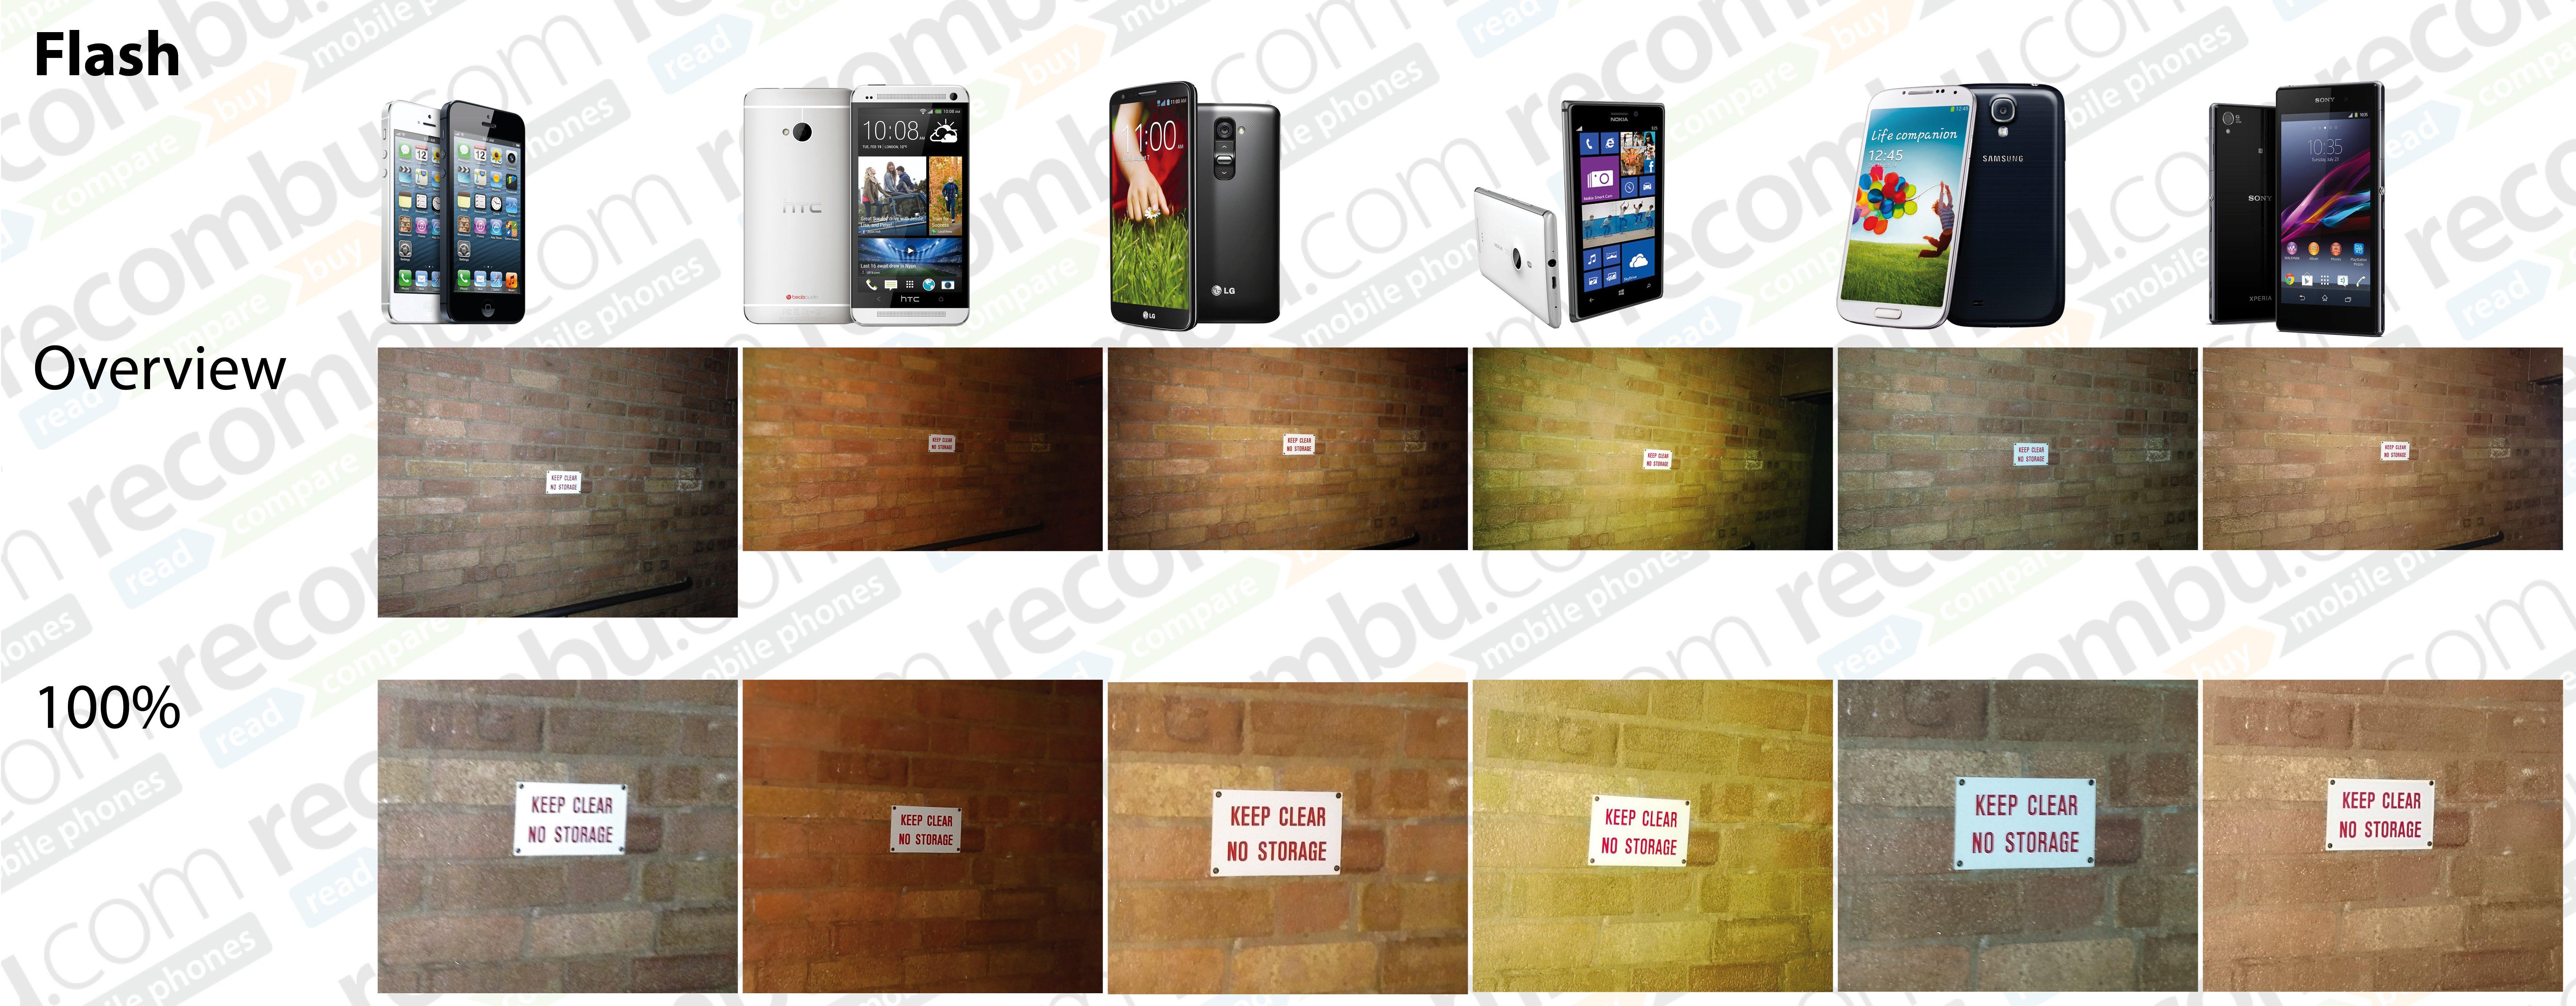 Тест камеры Sony Xperia Z1 и сравнение снимков со смартфонами конкурентами